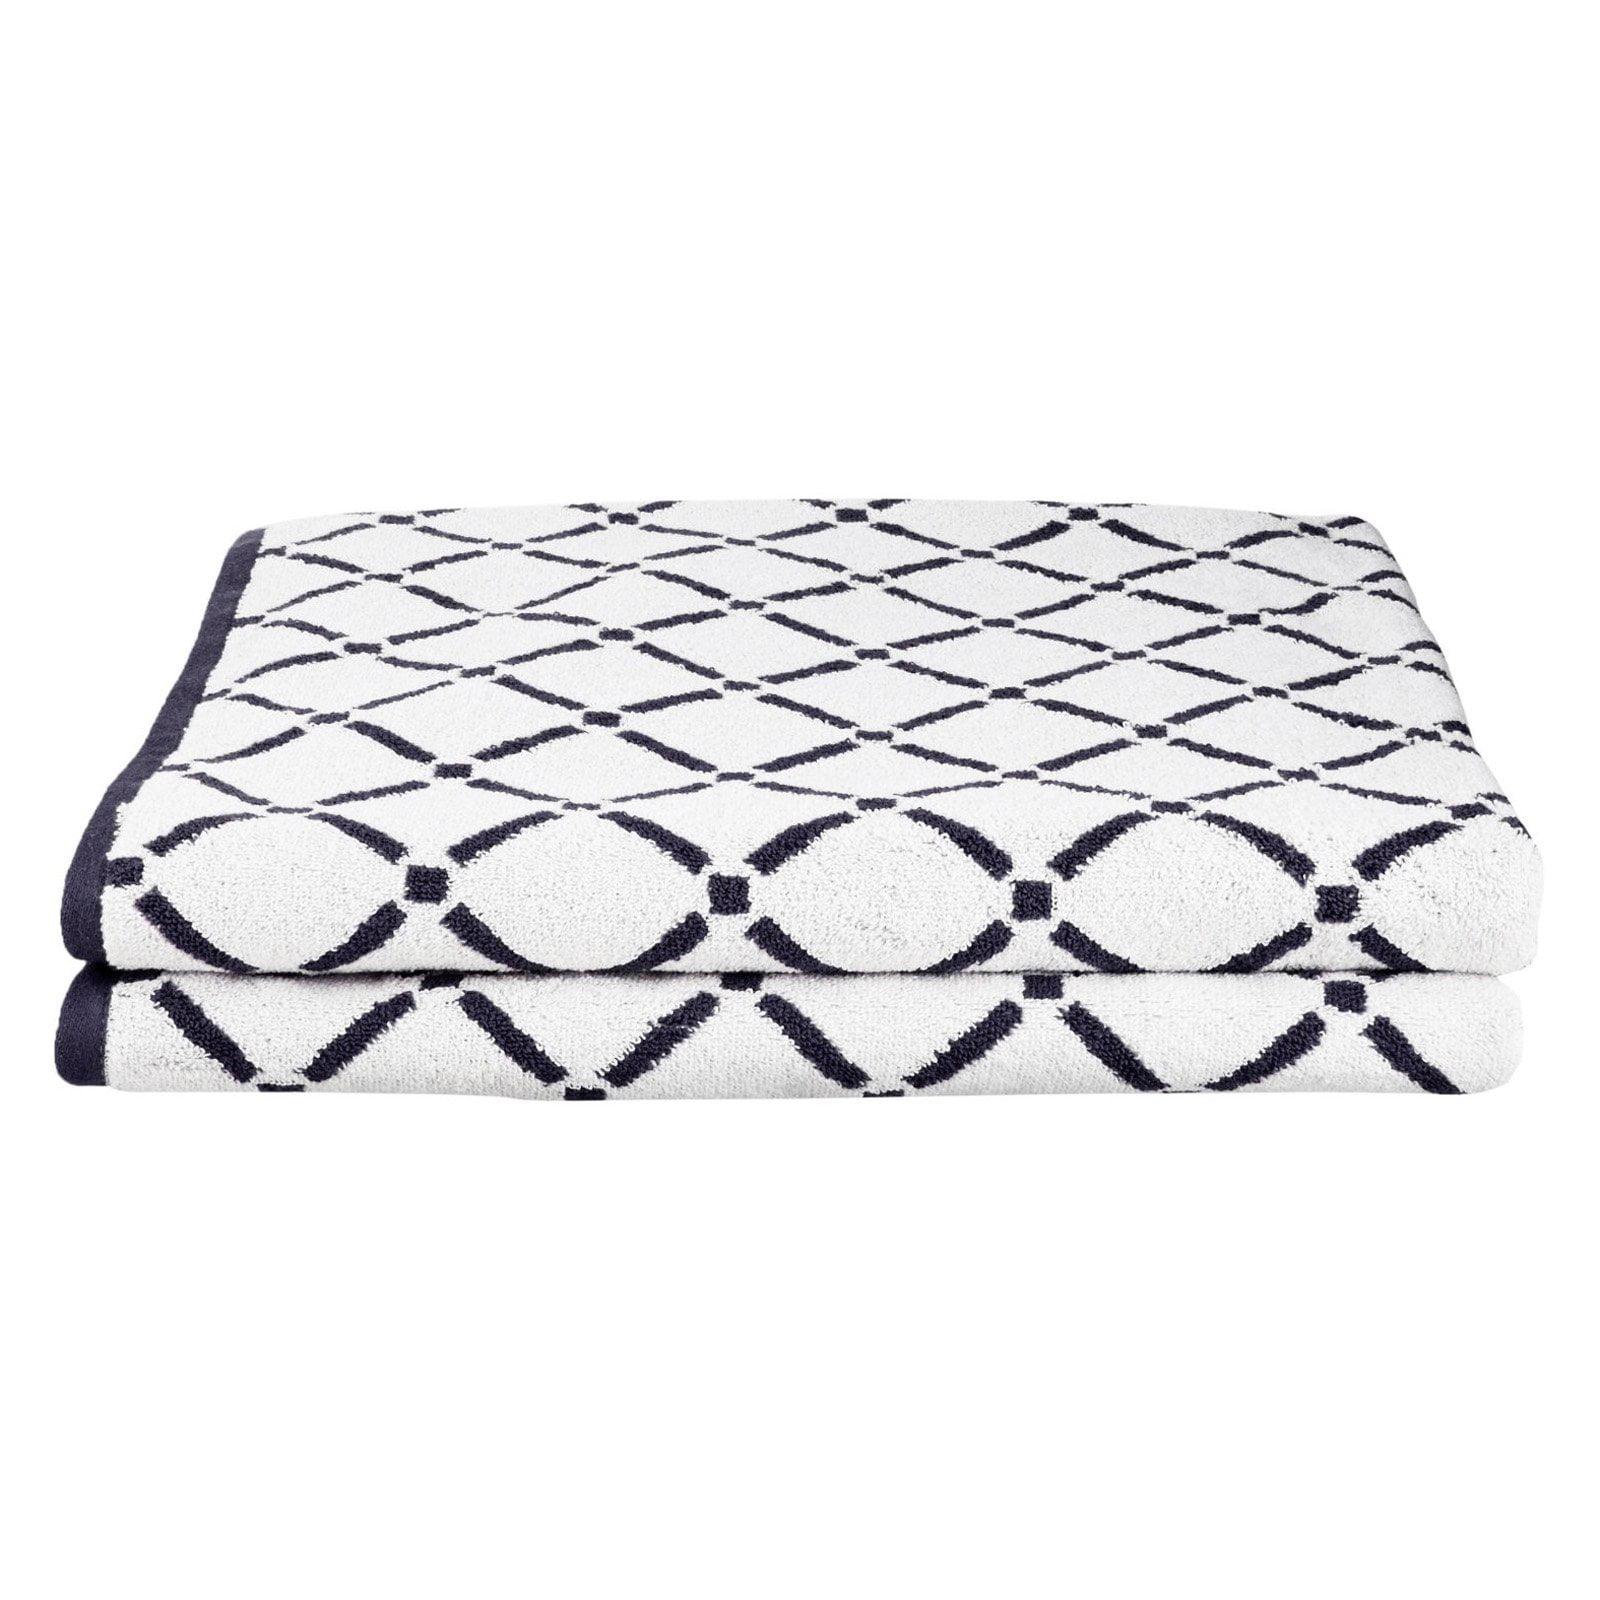 Superior Cotton Diamond Pattern 2-Piece Bath Towel Set by Blue Nile Mills